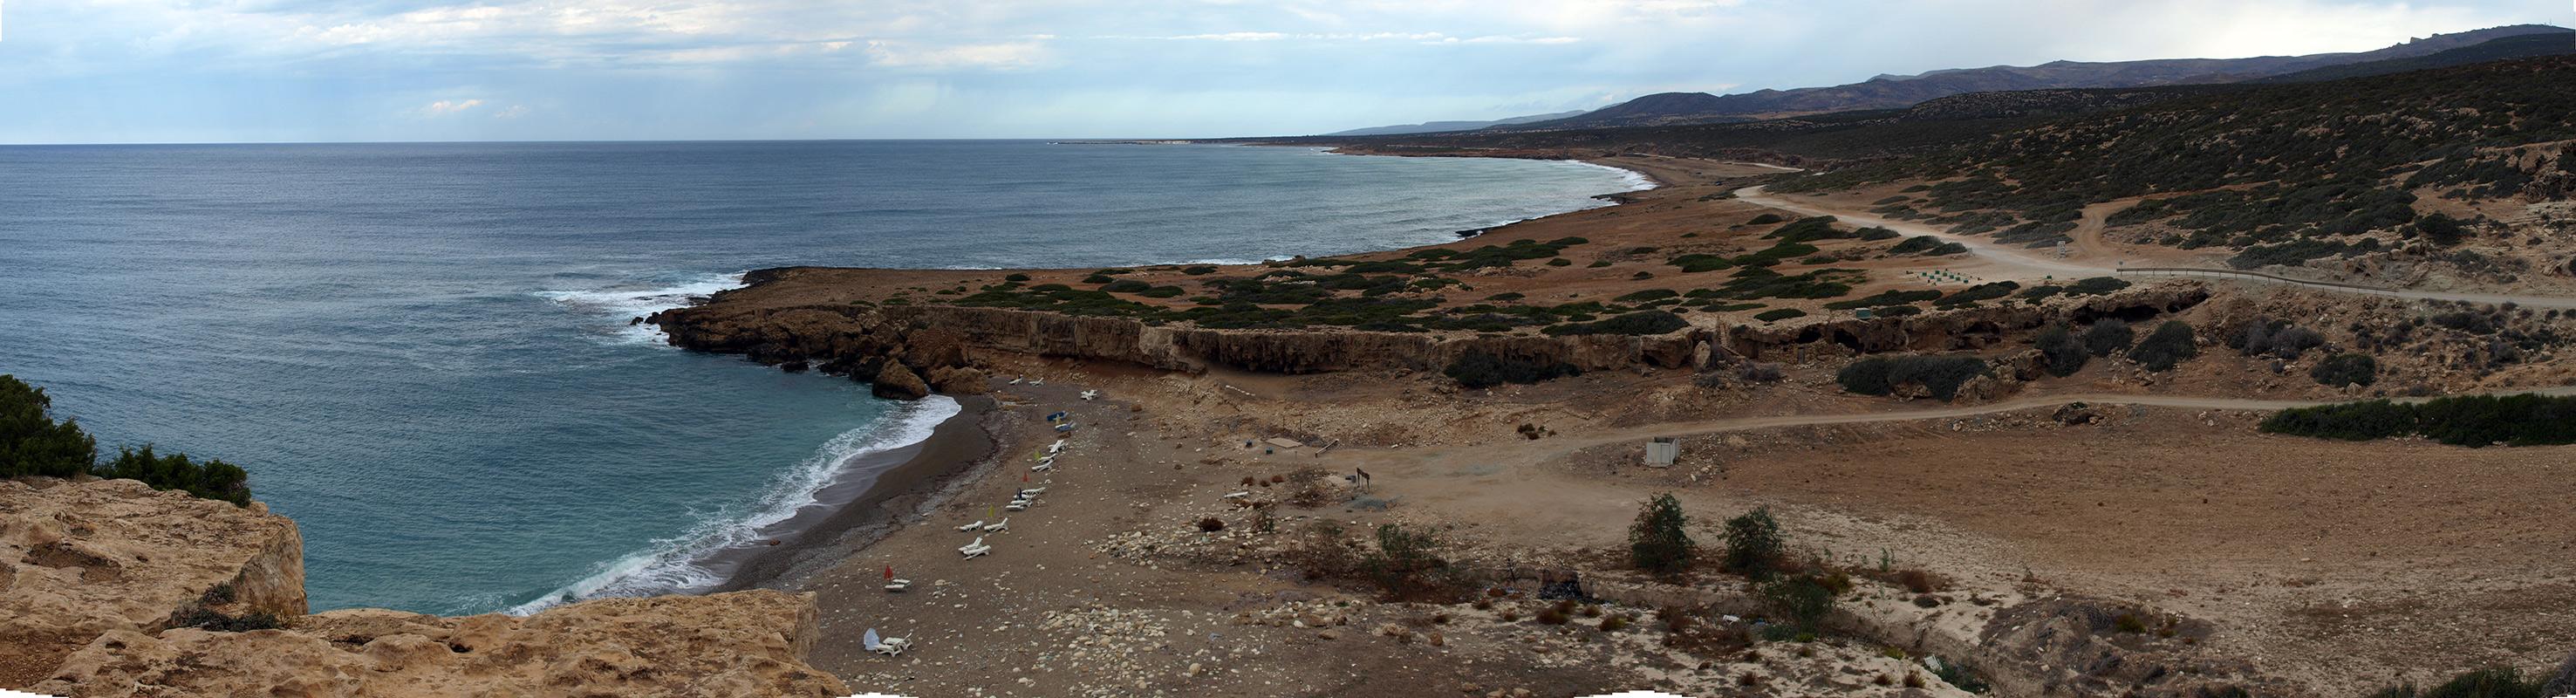 Панорама заповедника Акамас.   Кипр, осень 2014